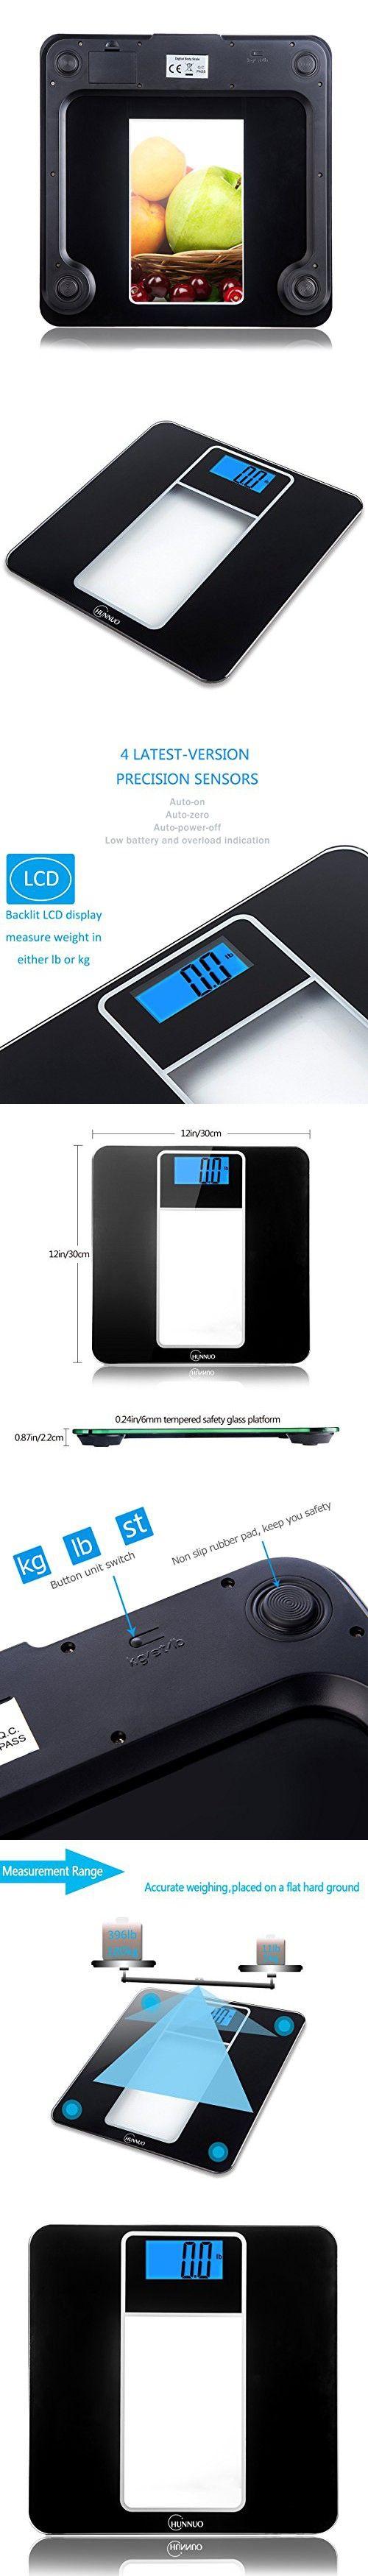 Digital bathroom scale digital body scale body weight scale digital - Digital Bathroom Scale Chunnuo 396lb 180kg Precision Body Weight Scale With Smart Step